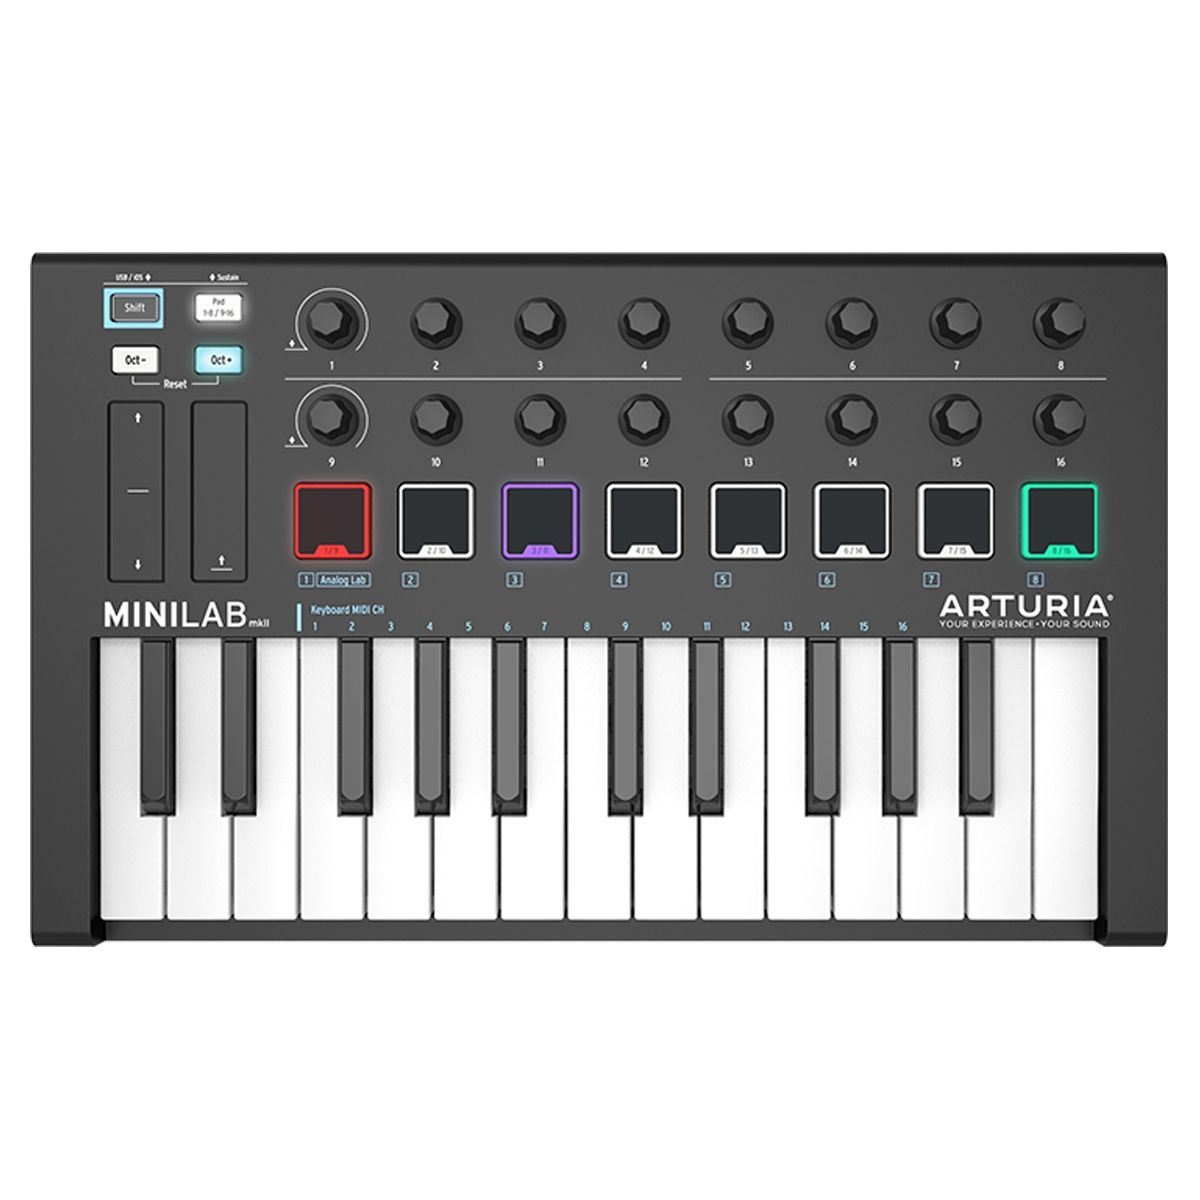 Arturia MiniLab MKII USB MIDI Controller (Black)